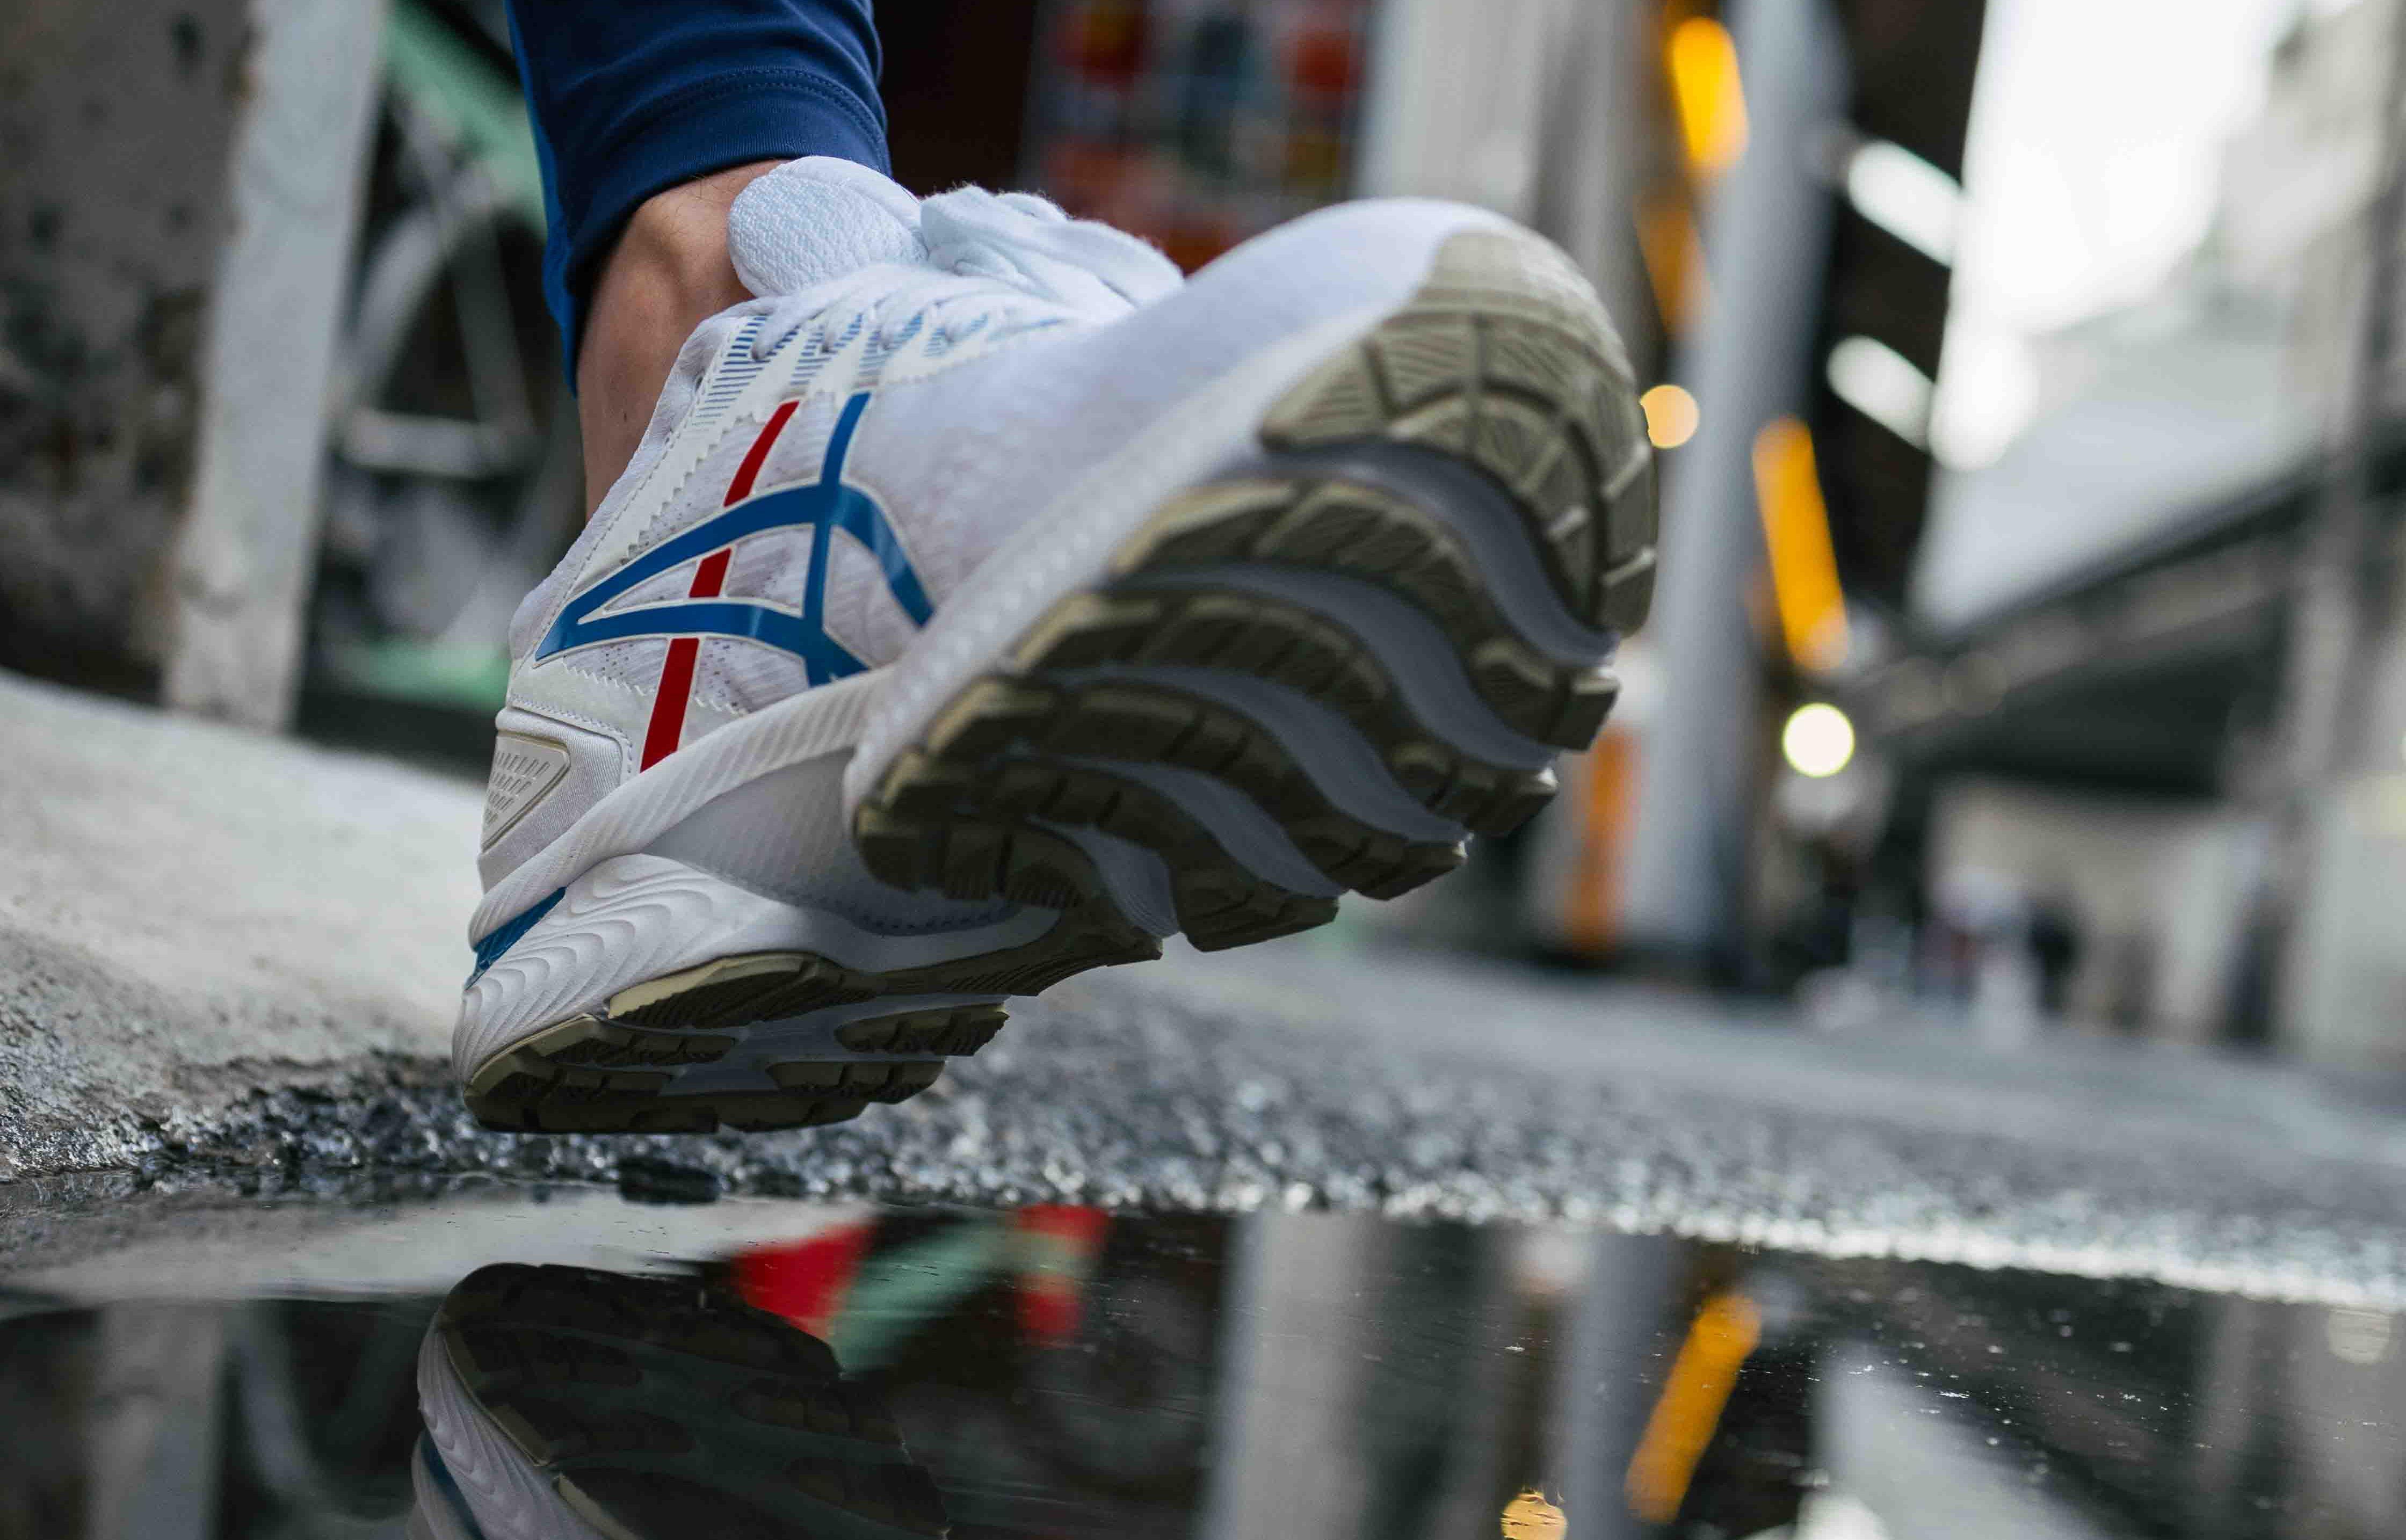 Shoe review: GEL-NIMBUS 22 Retro Tokyo   ASICS South Africa